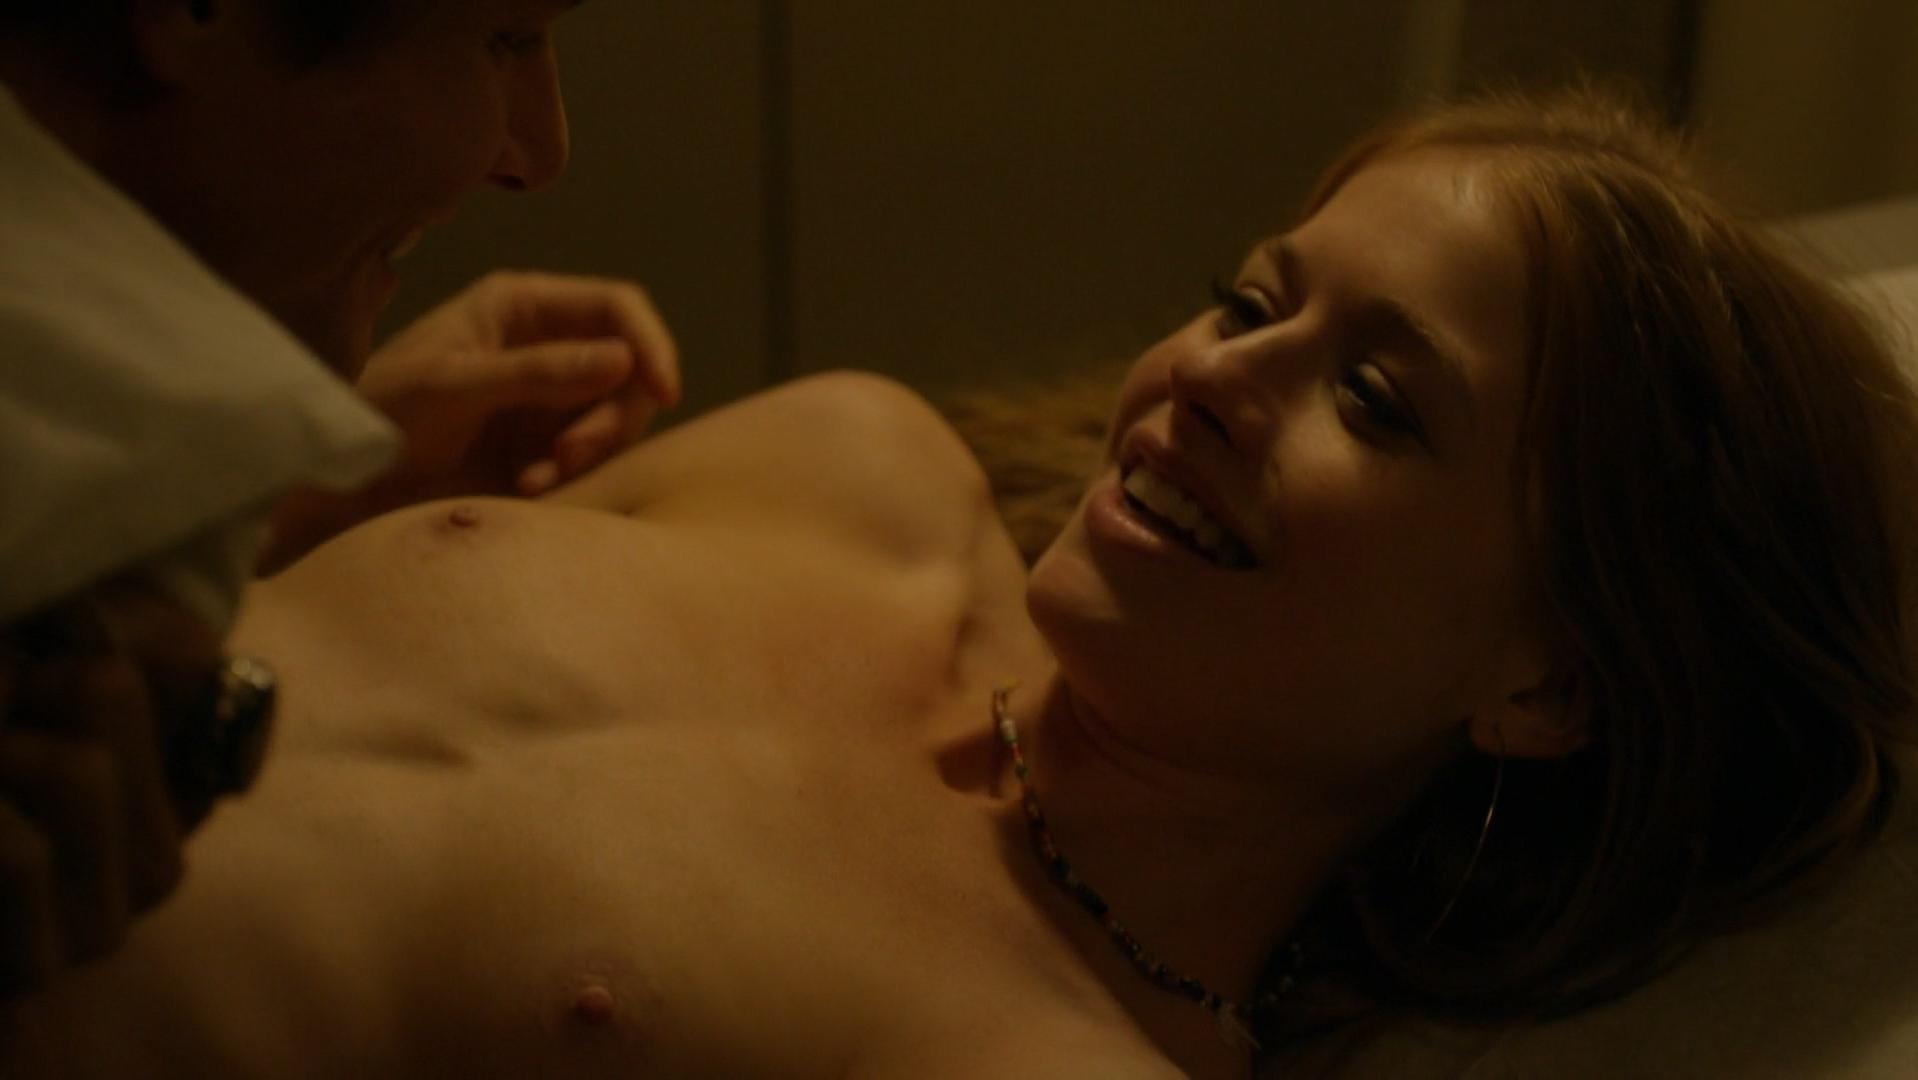 Genevieve Angelson nude - Good Girls Revolt s01e01 (2015)